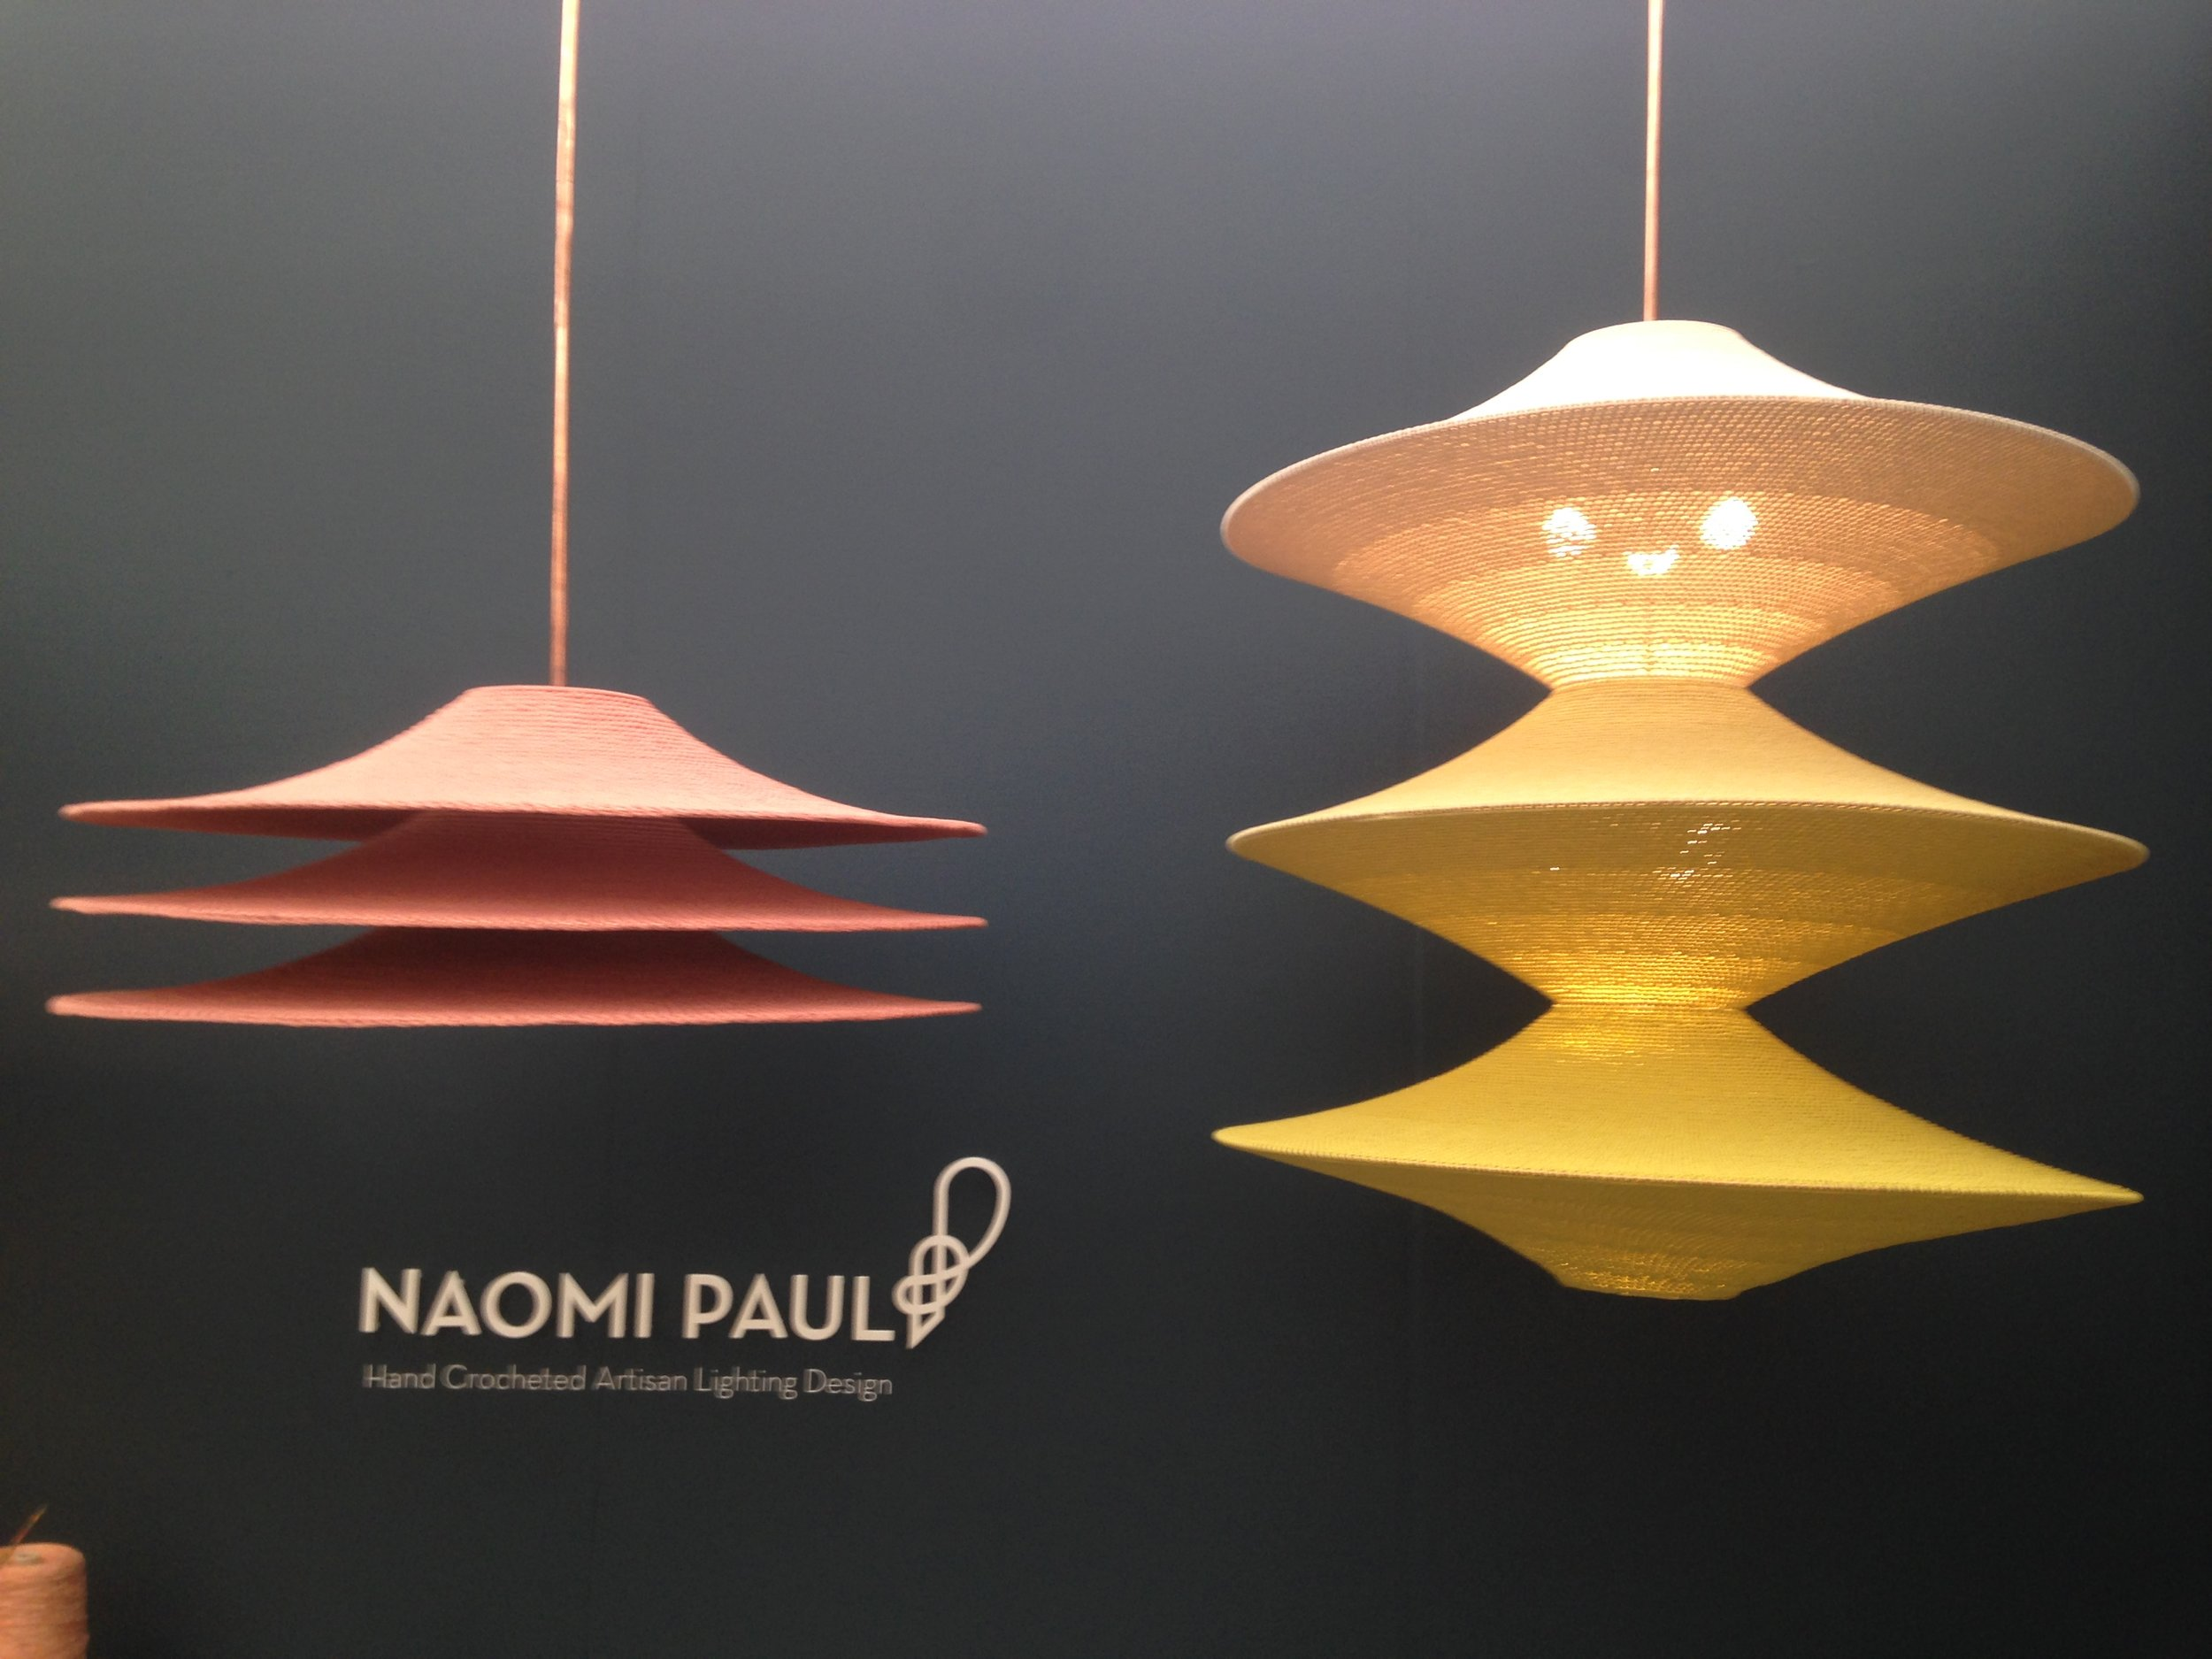 Naomi Paul